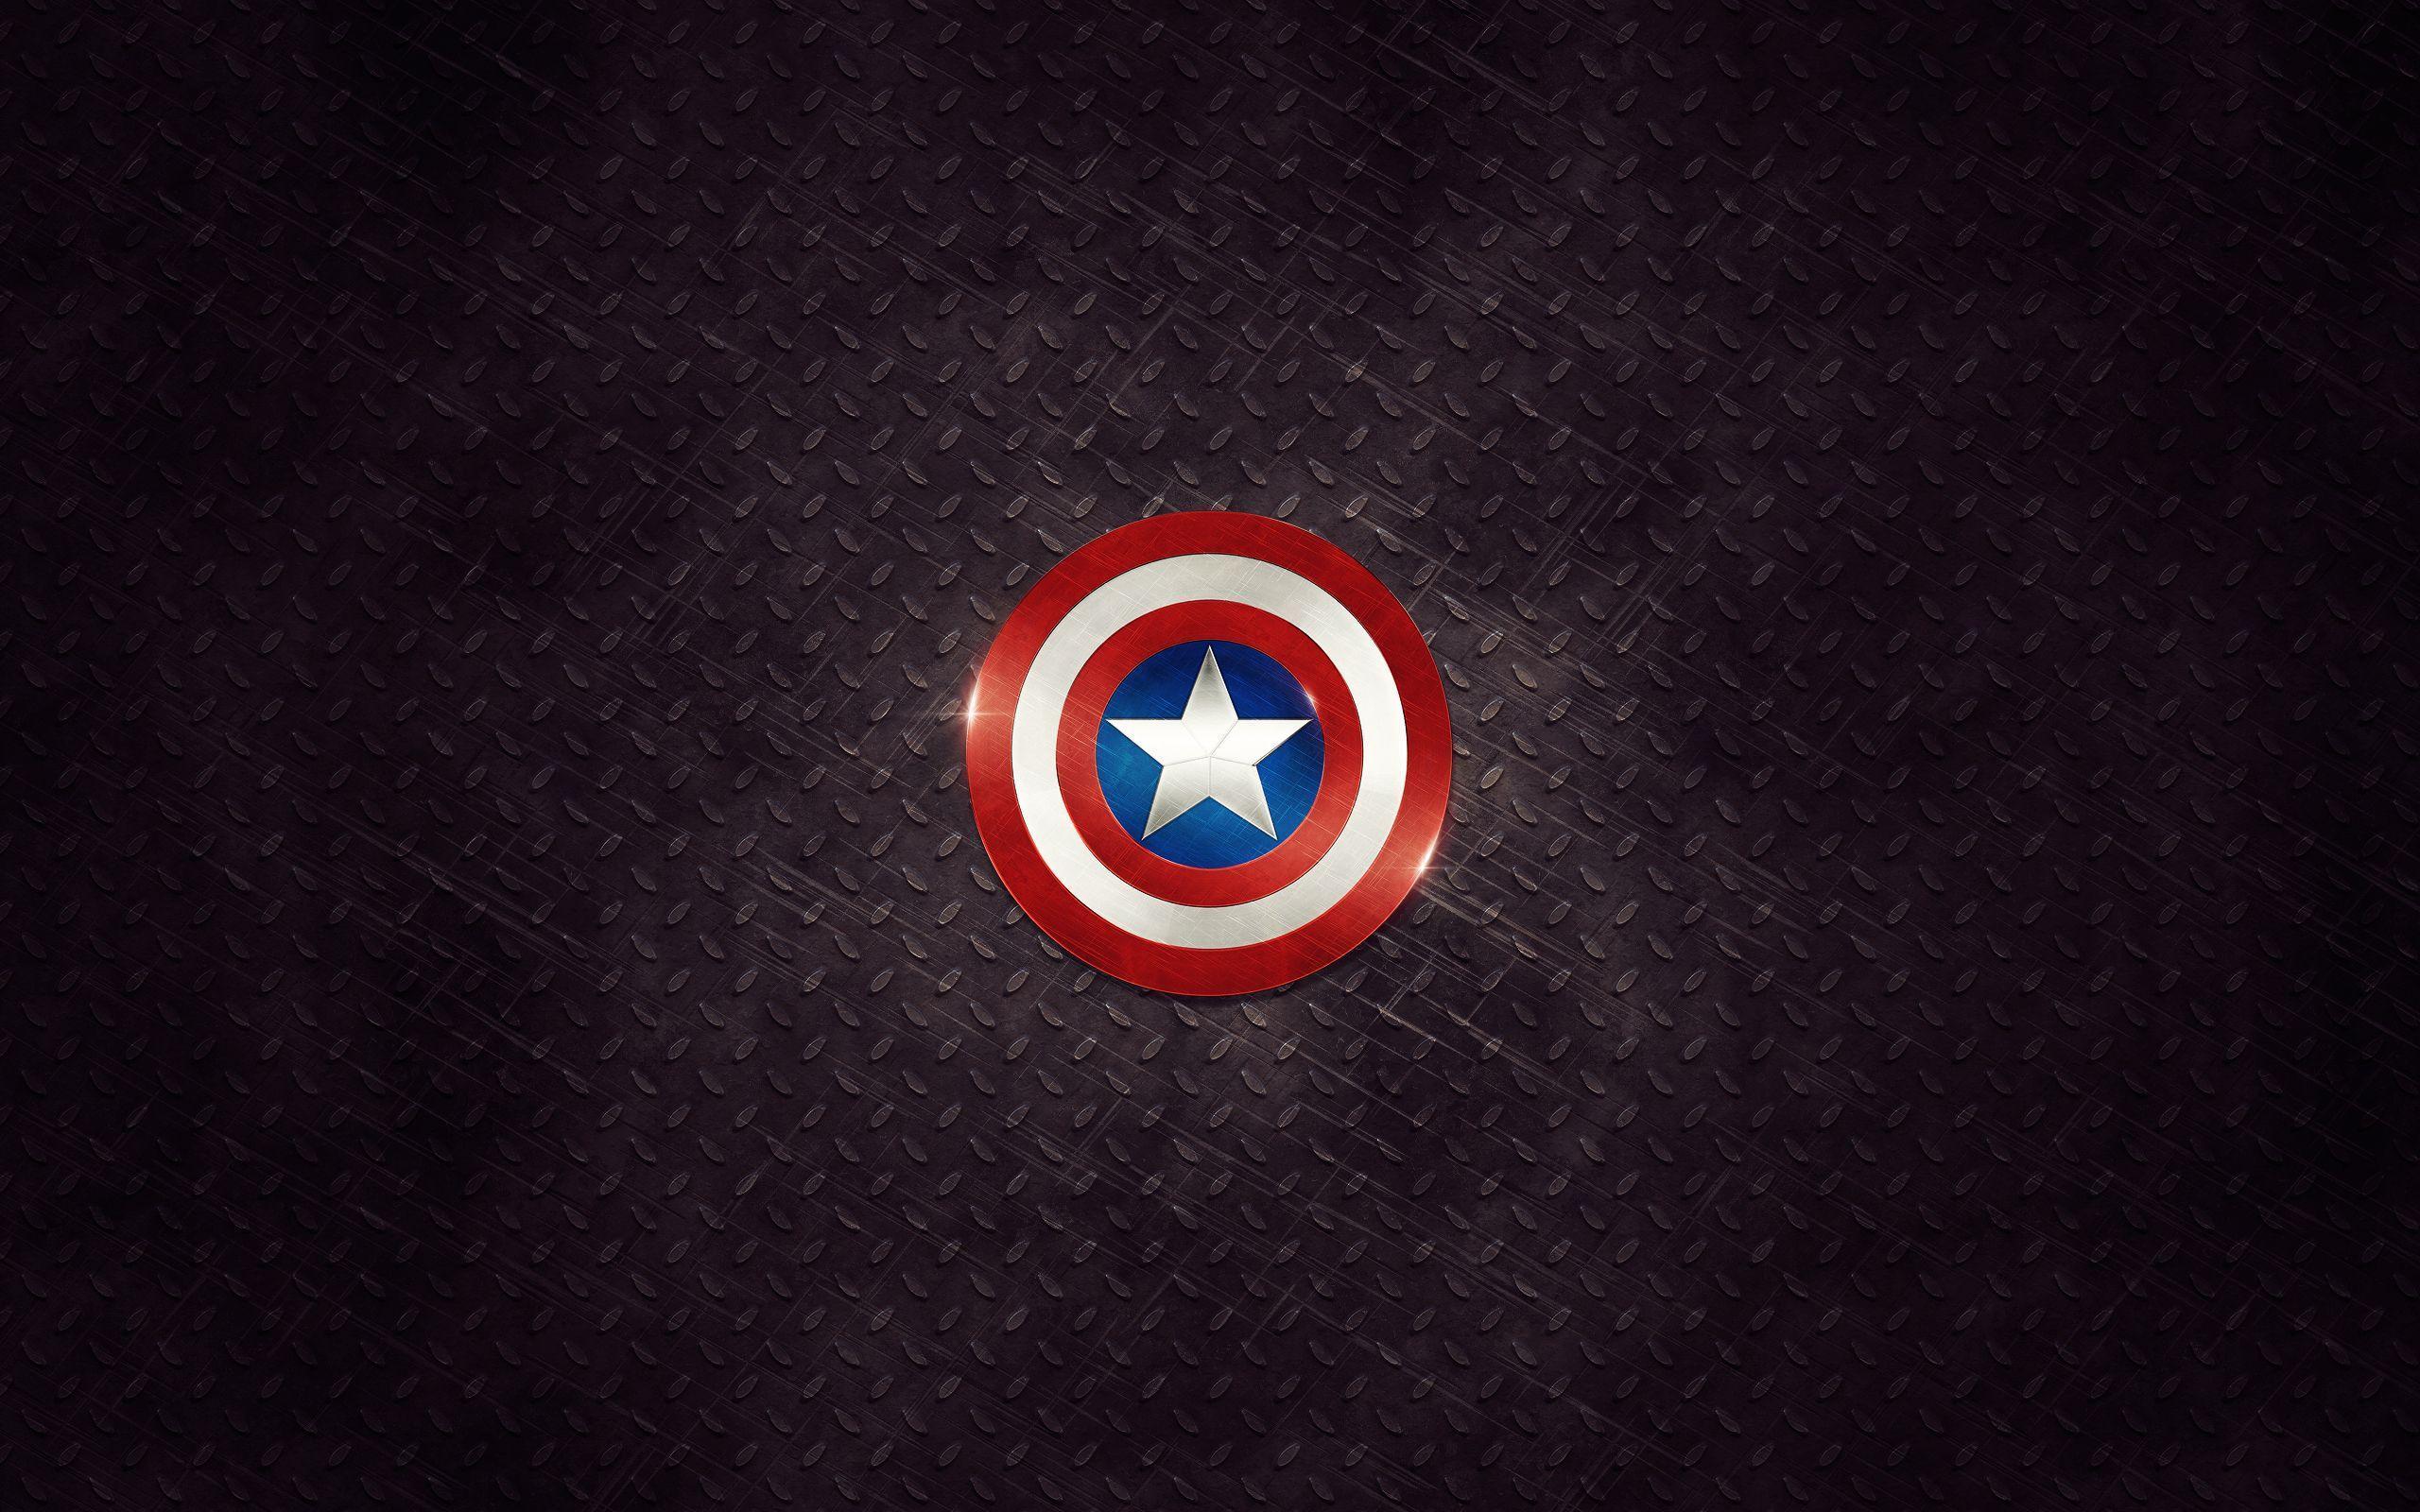 Captain America Logo Wallpapers Wallpaper Cave